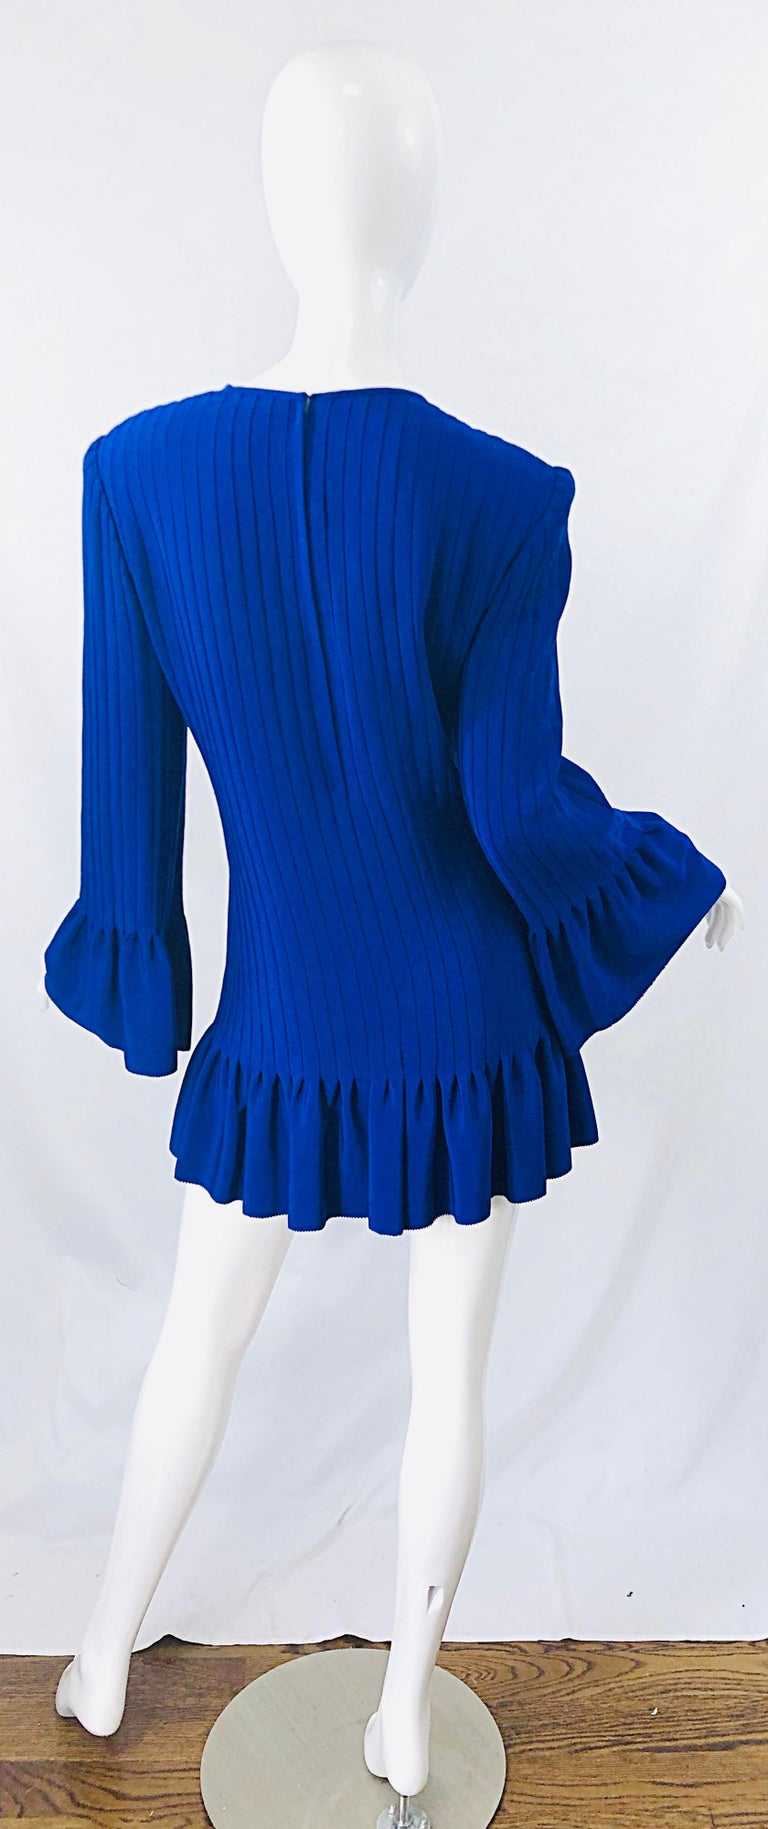 Vintage Tarquin Ebker Royal Blue 1980s Silk Pleated 80s Mini Dress Tunic Shirt For Sale 5